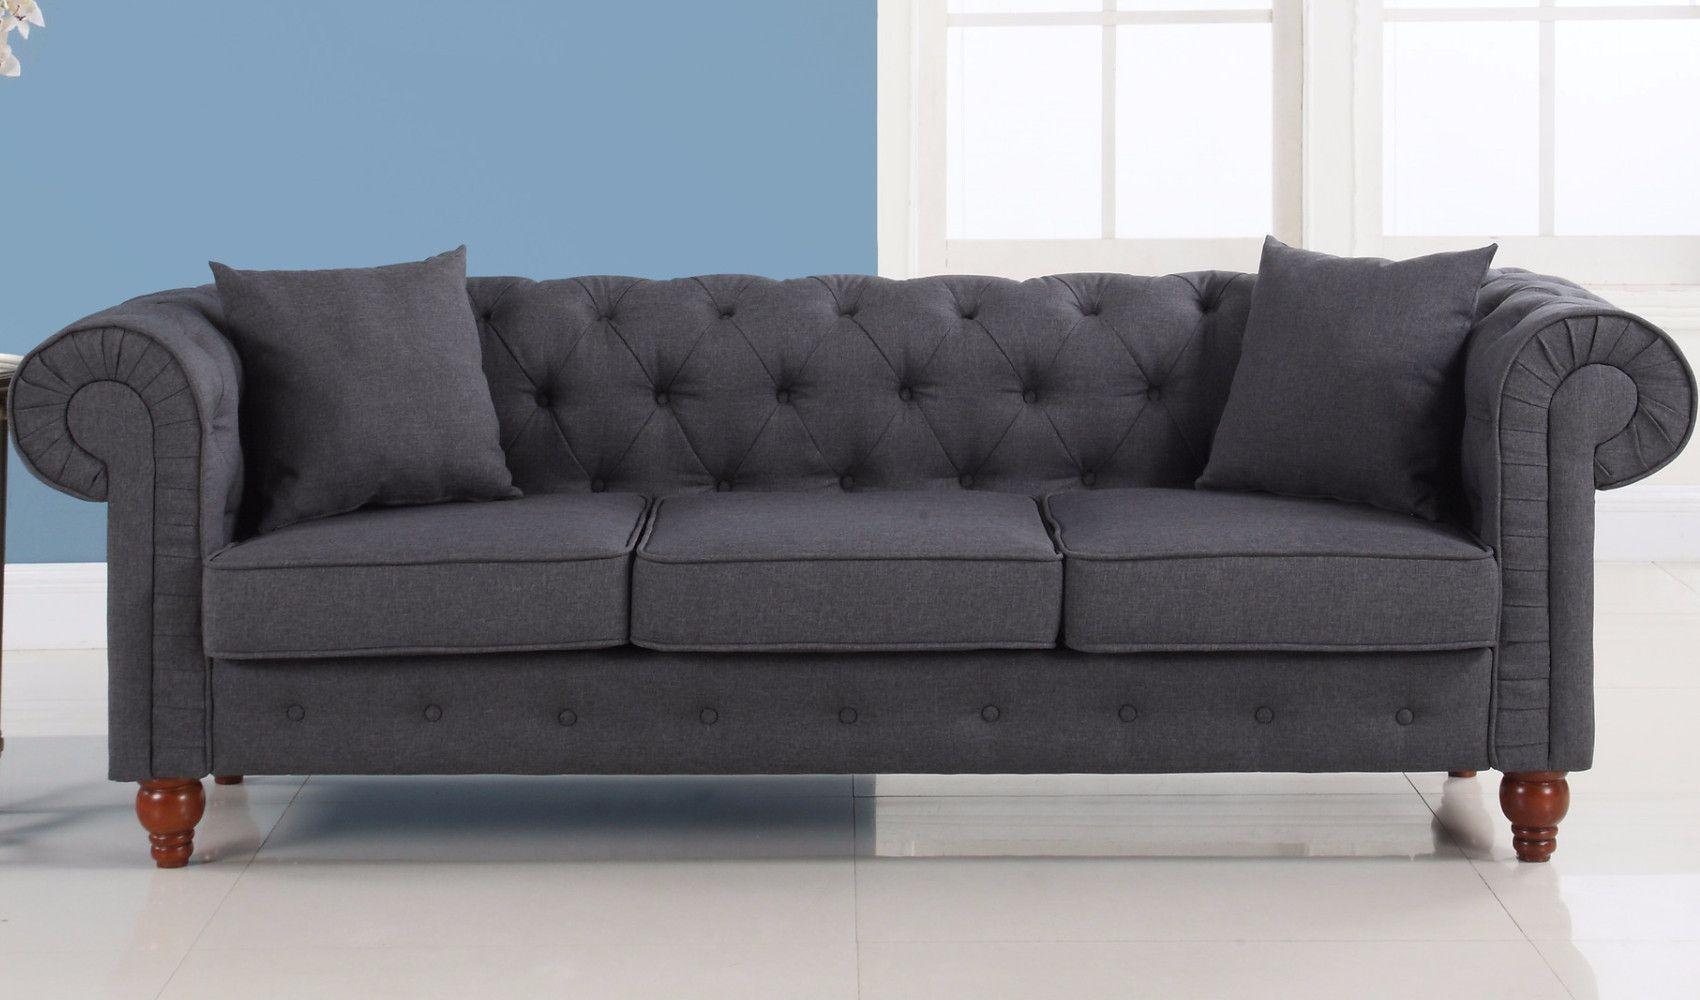 Stratford Classic Grey Fabric Chesterfield Sofa Sofa Classic